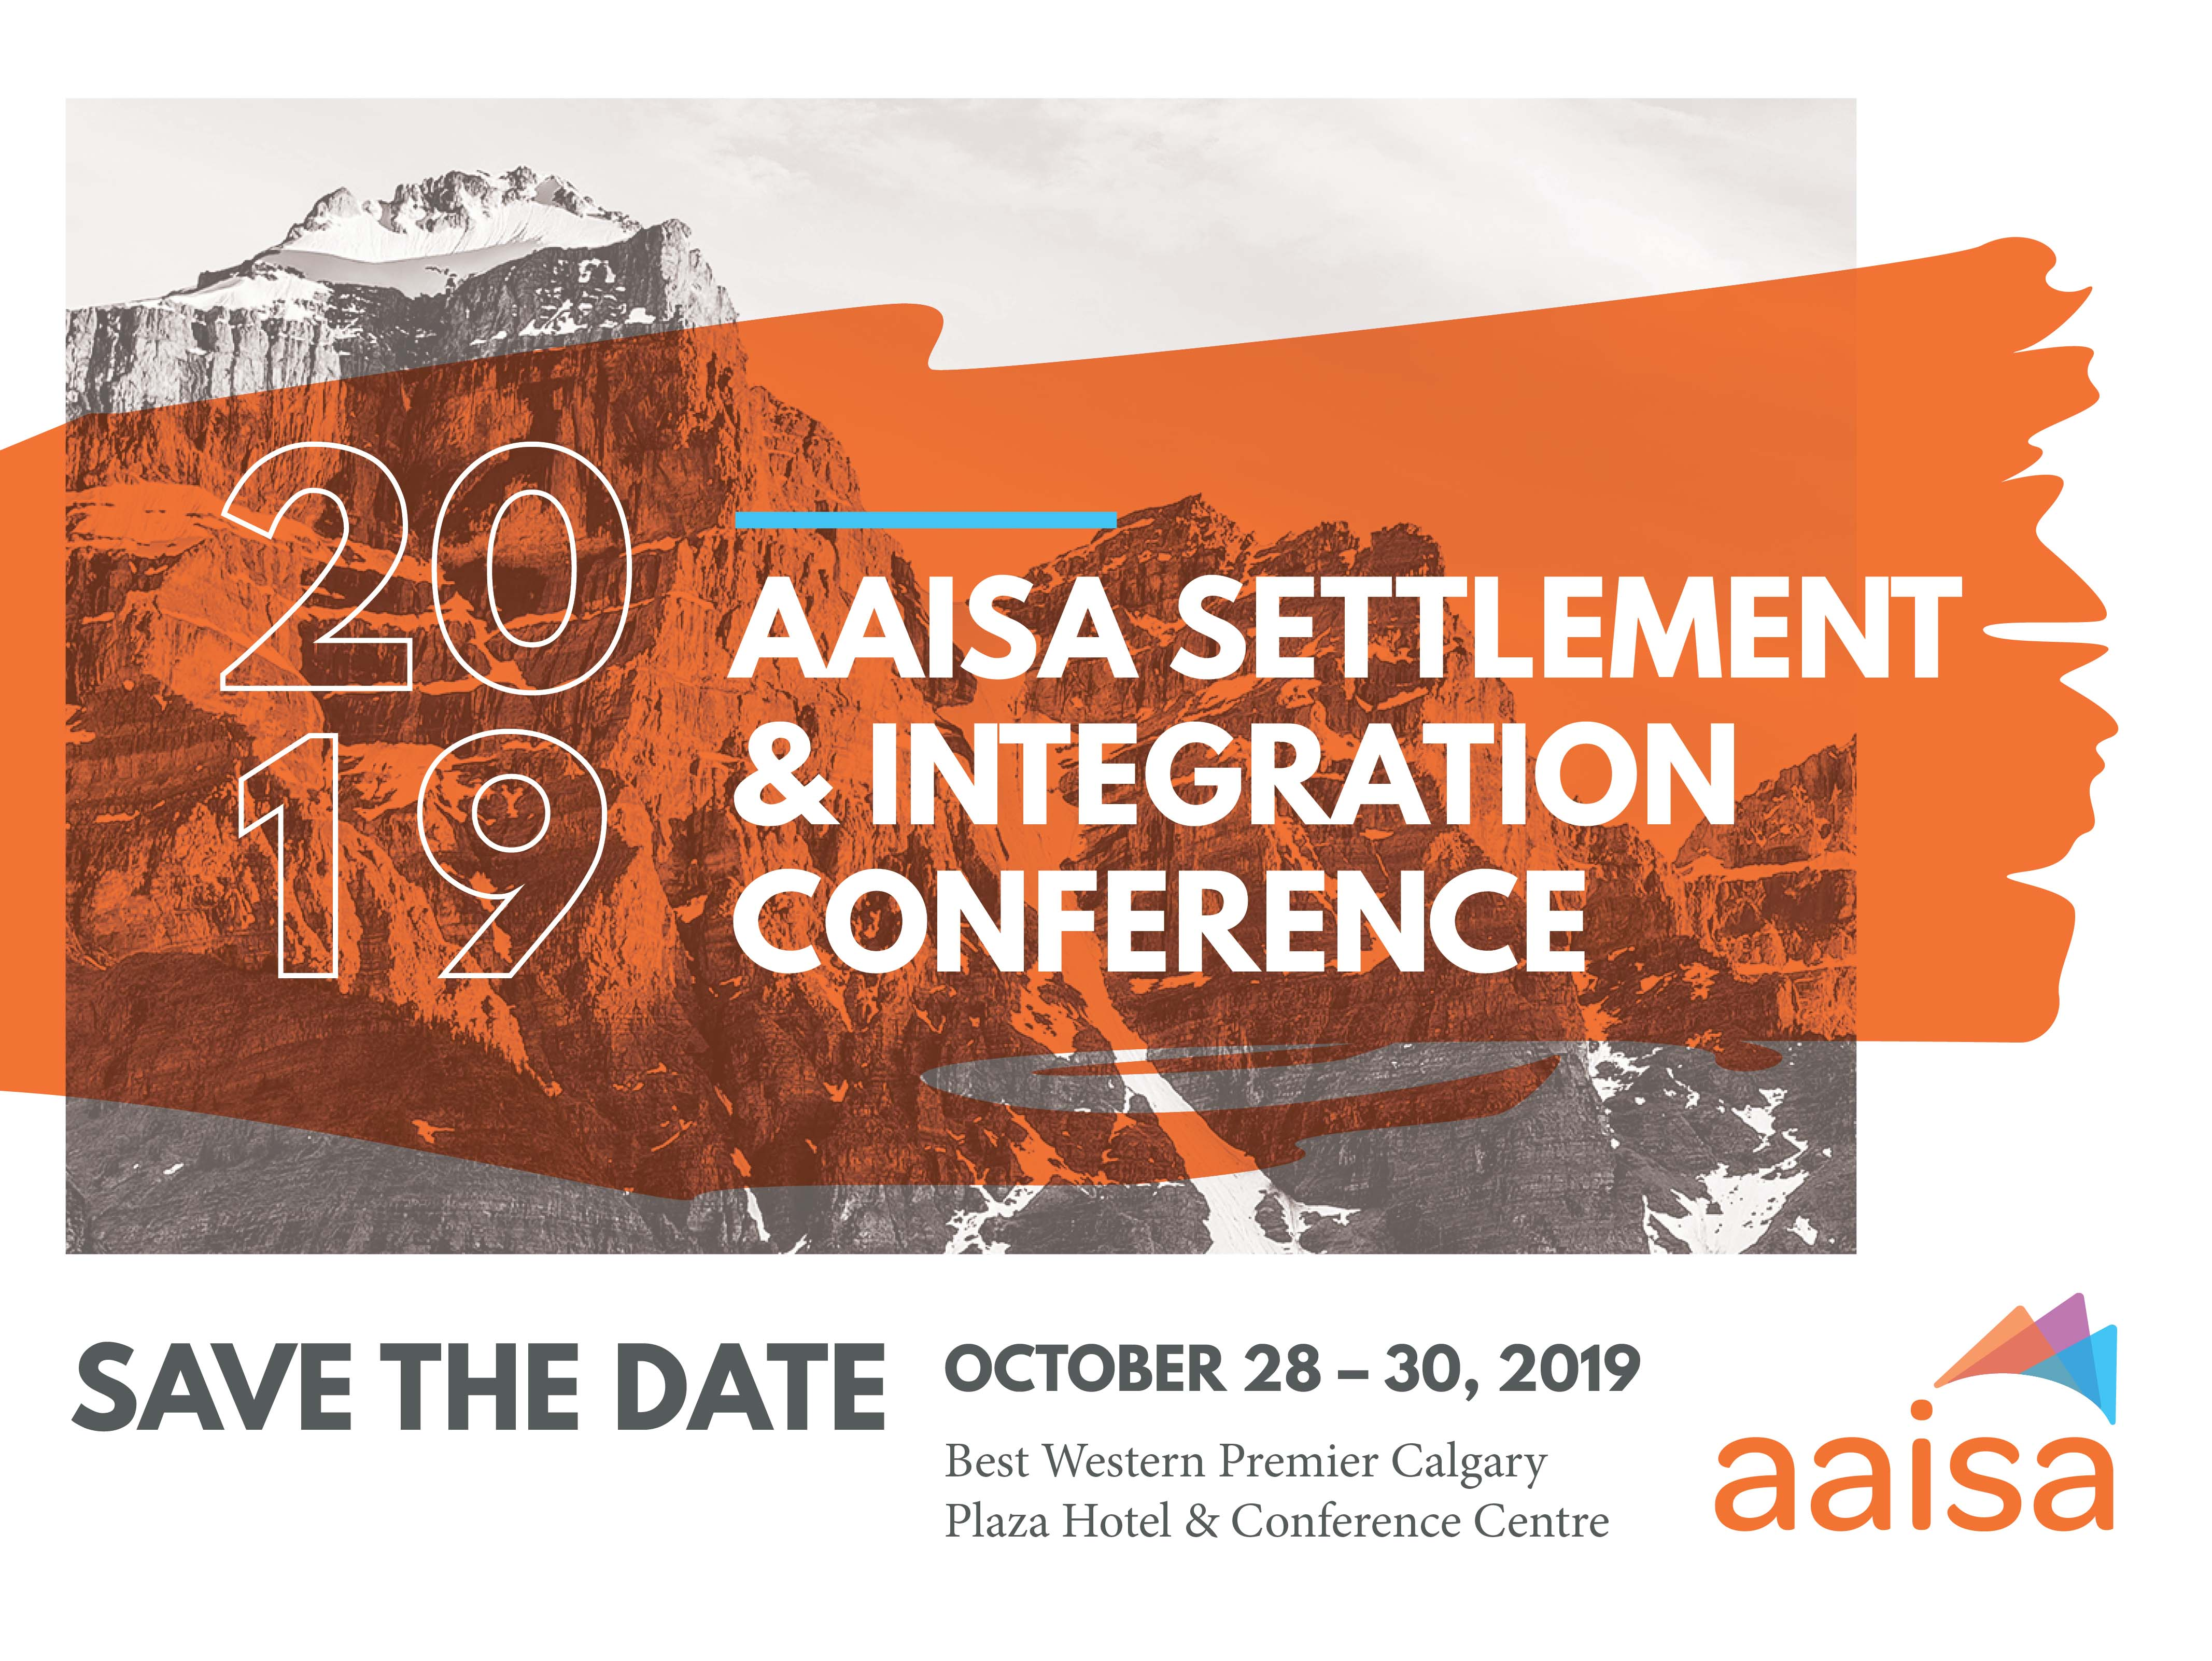 2019 AAISA Settlement & Integration Conference